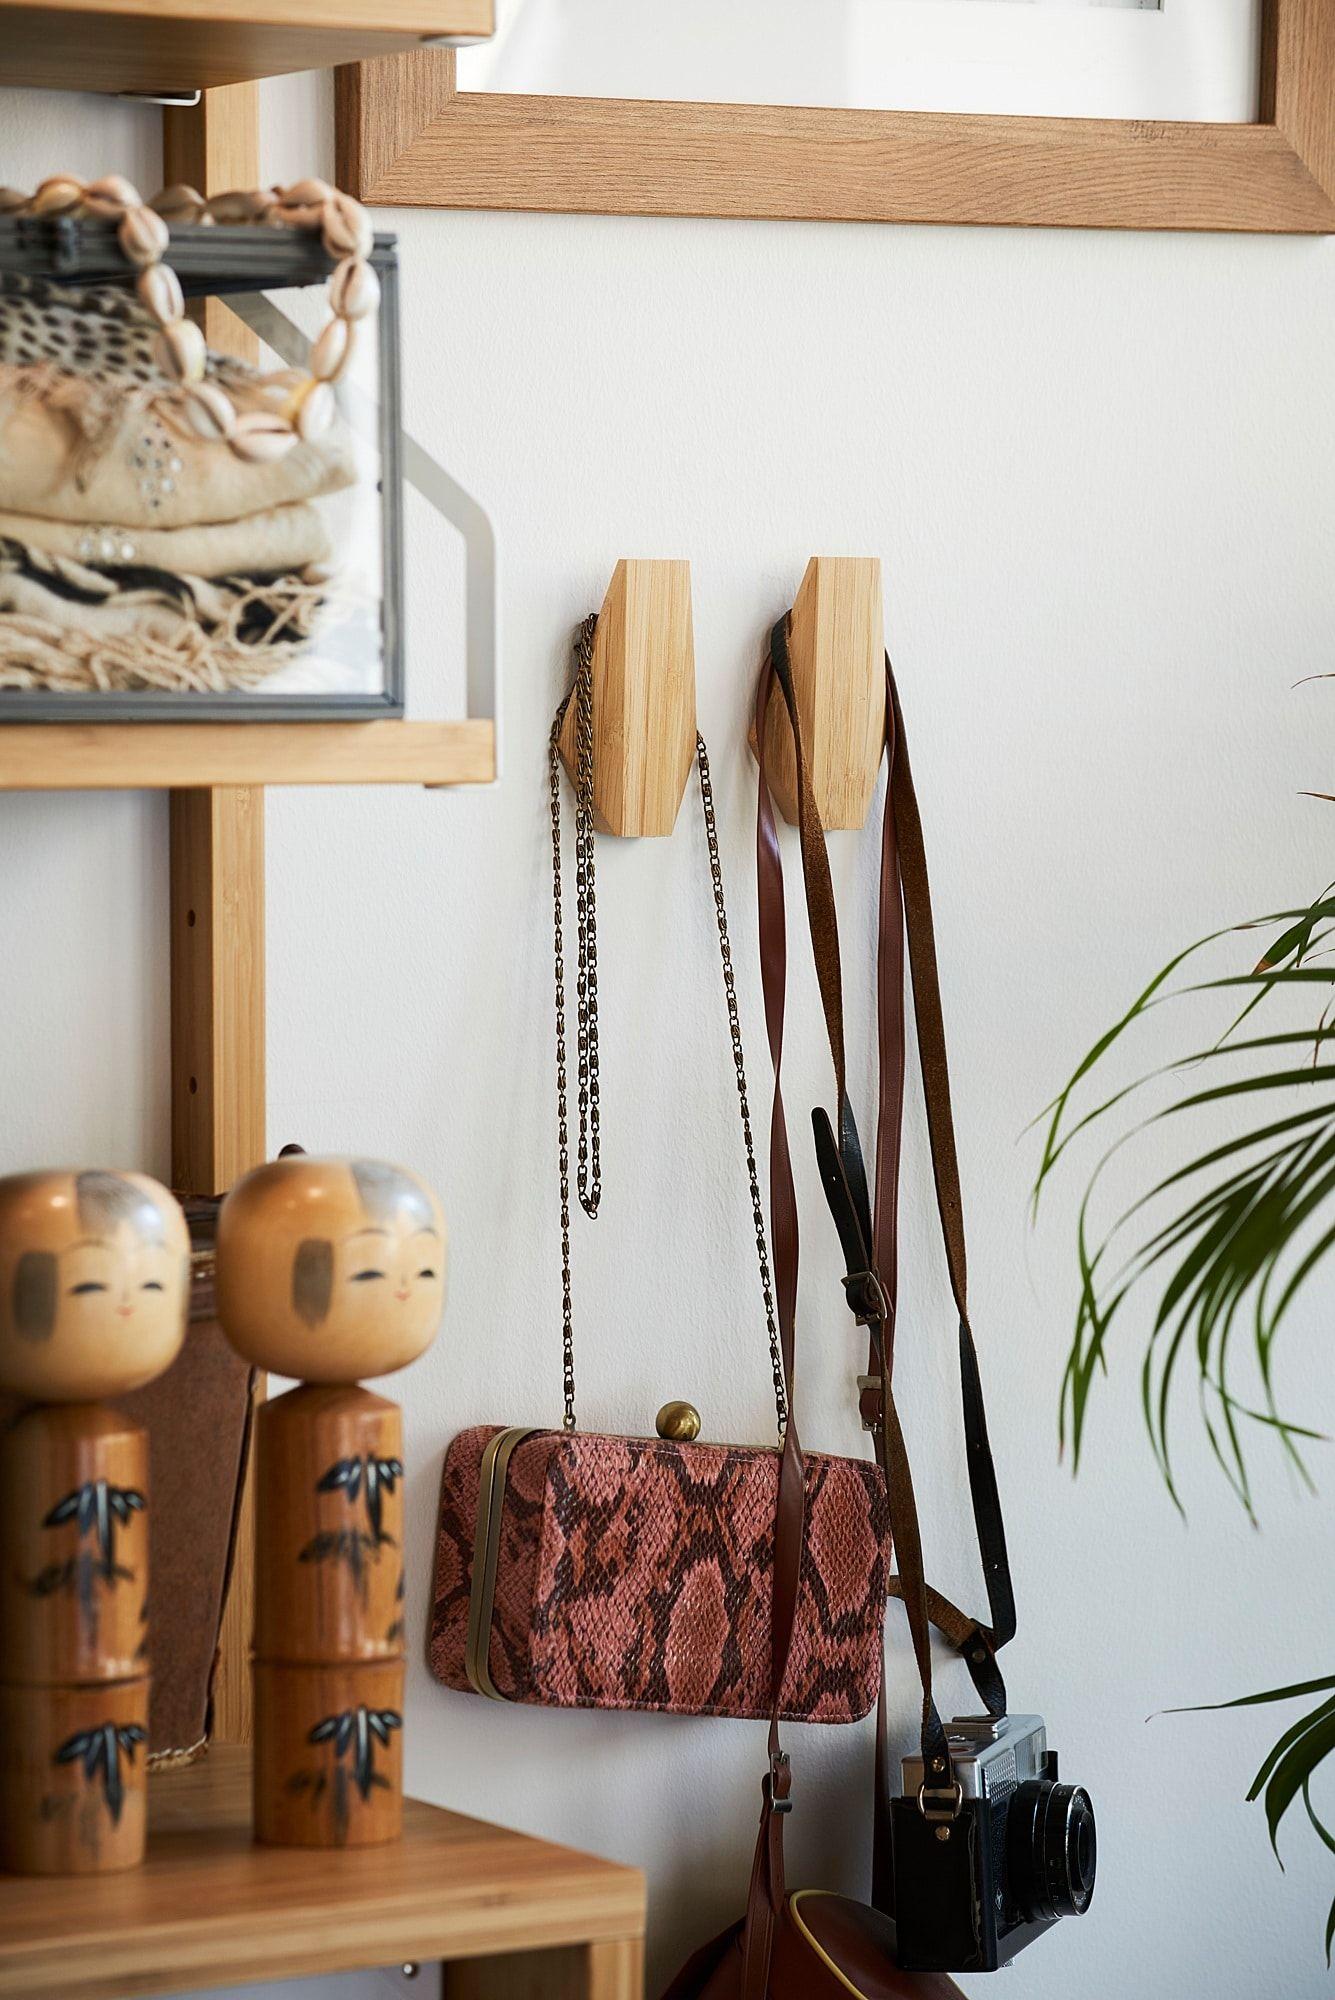 Skuggis Krok Bambu Bredd 5 4 Cm Ikea In 2020 Ikea Bamboo Cleaning Clothes